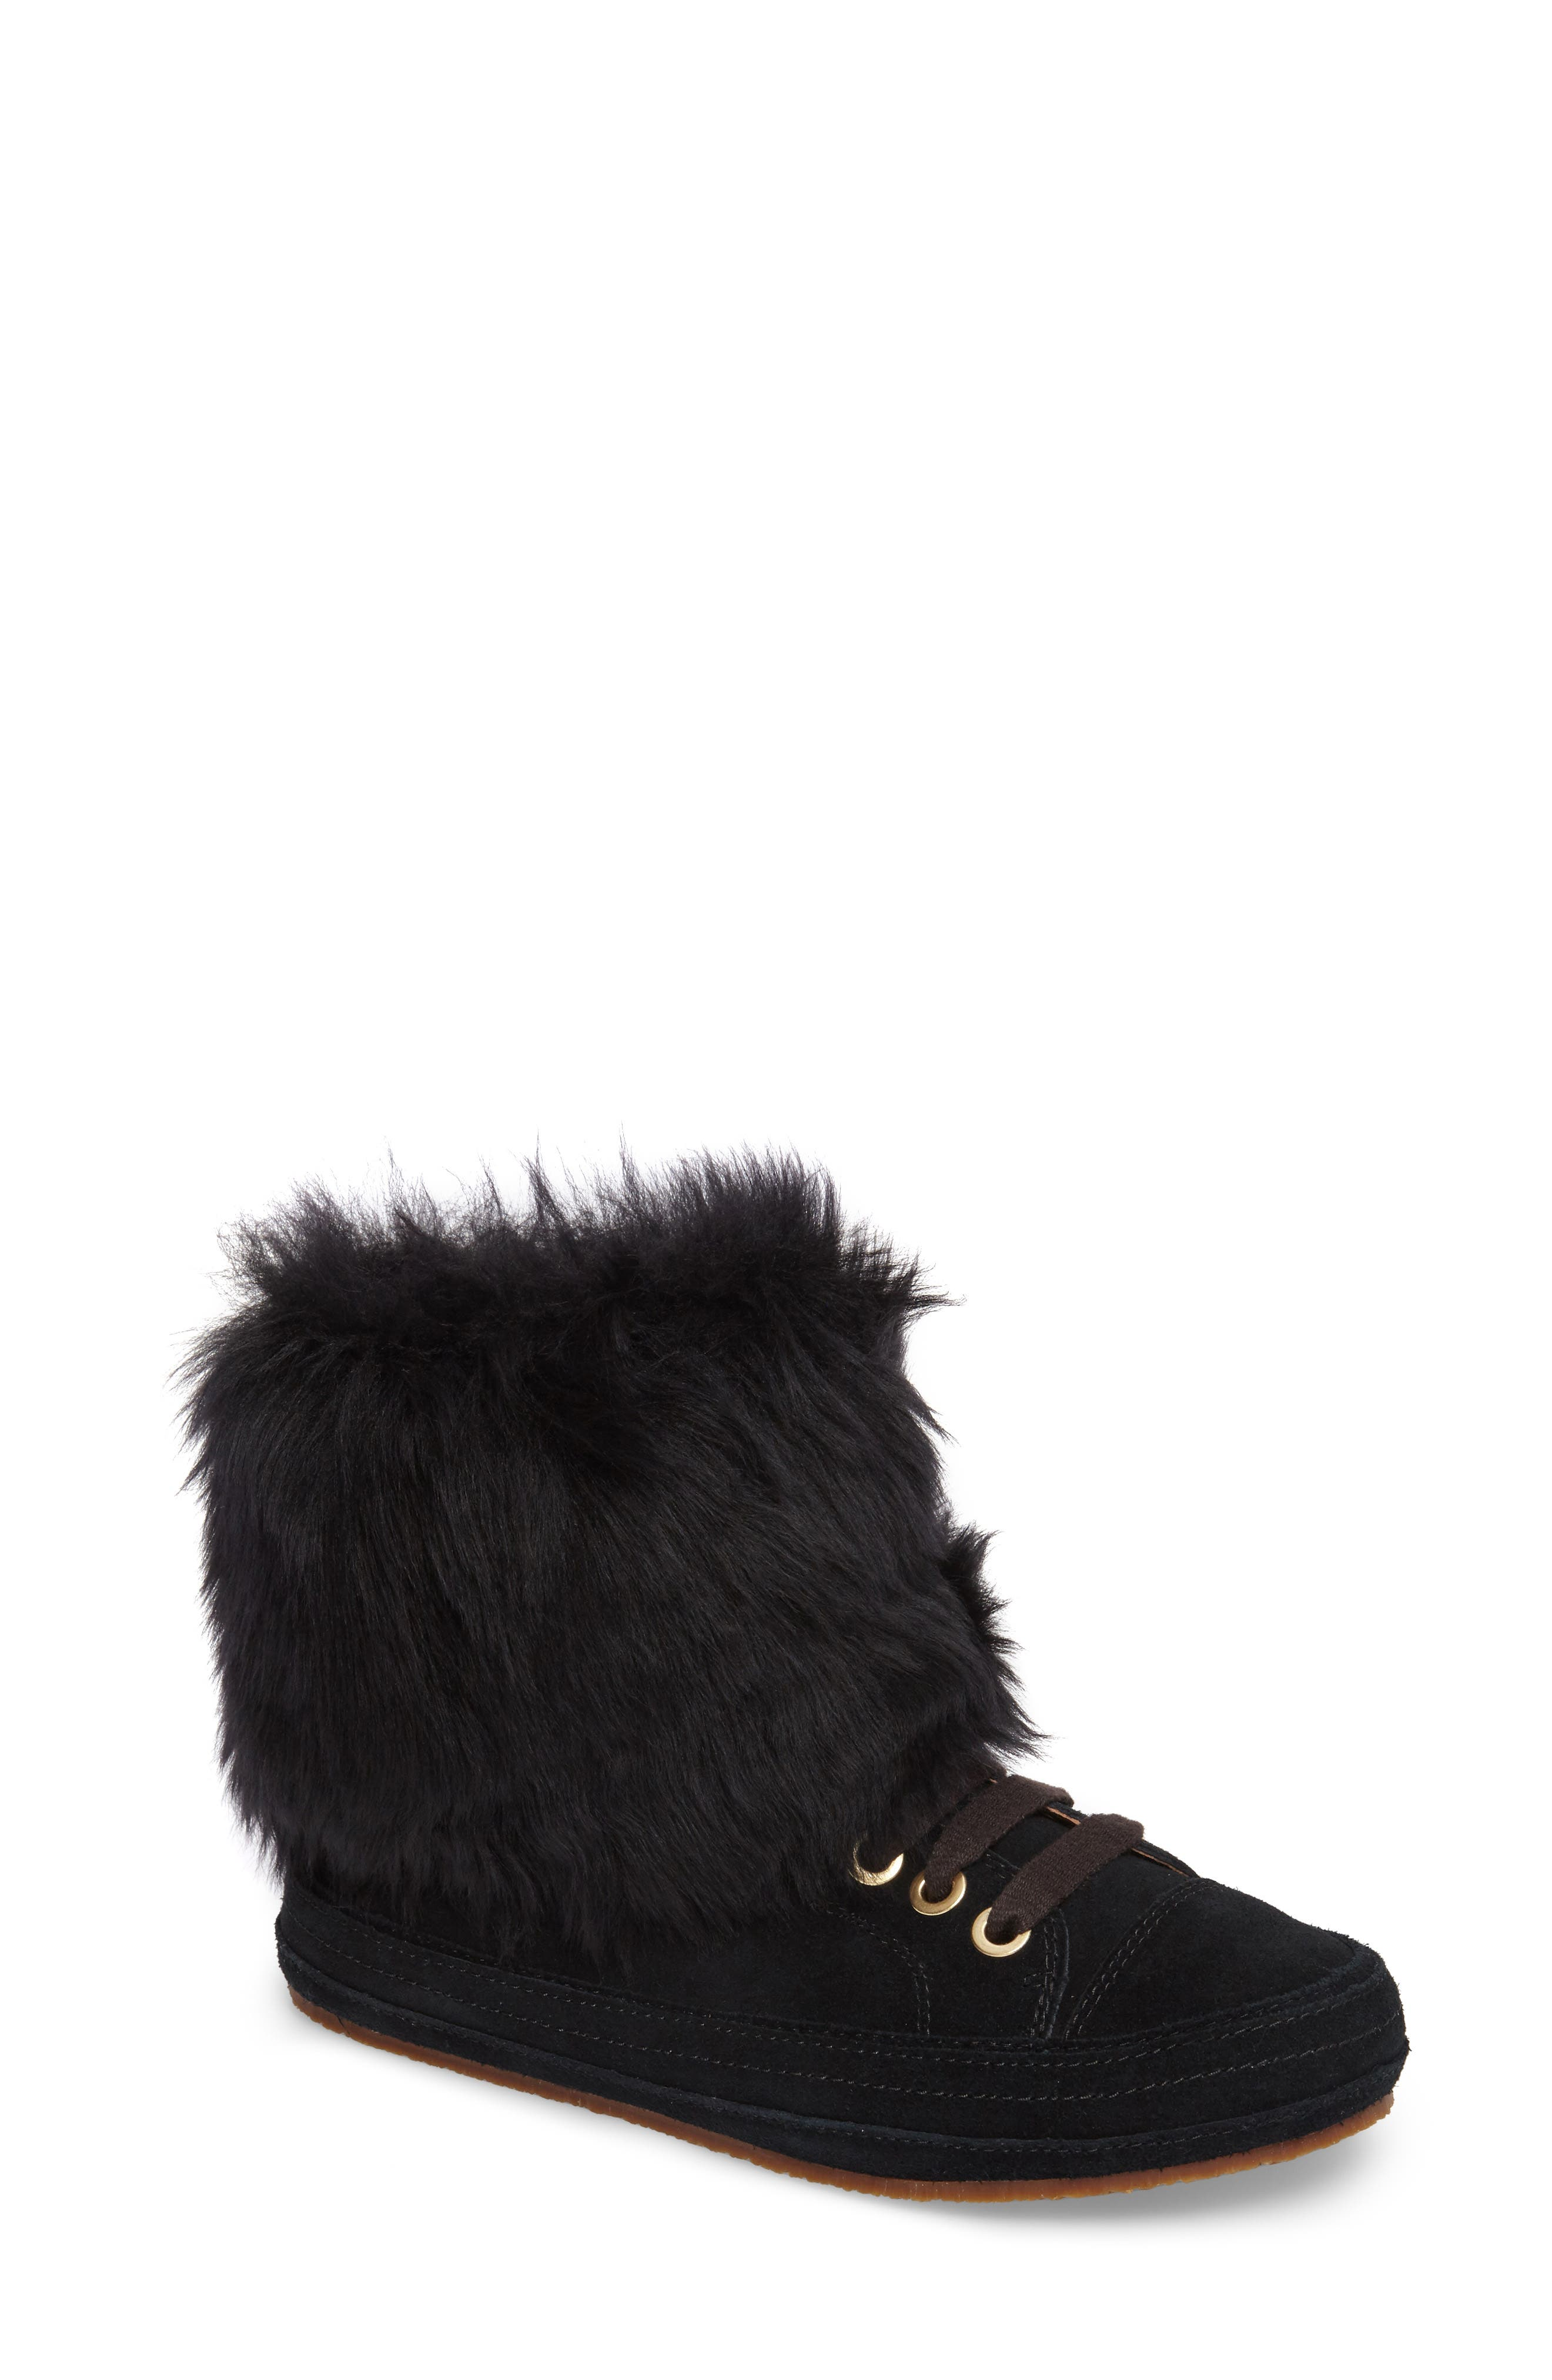 Antoine Fur Cuff Sneaker, Main, color, 001